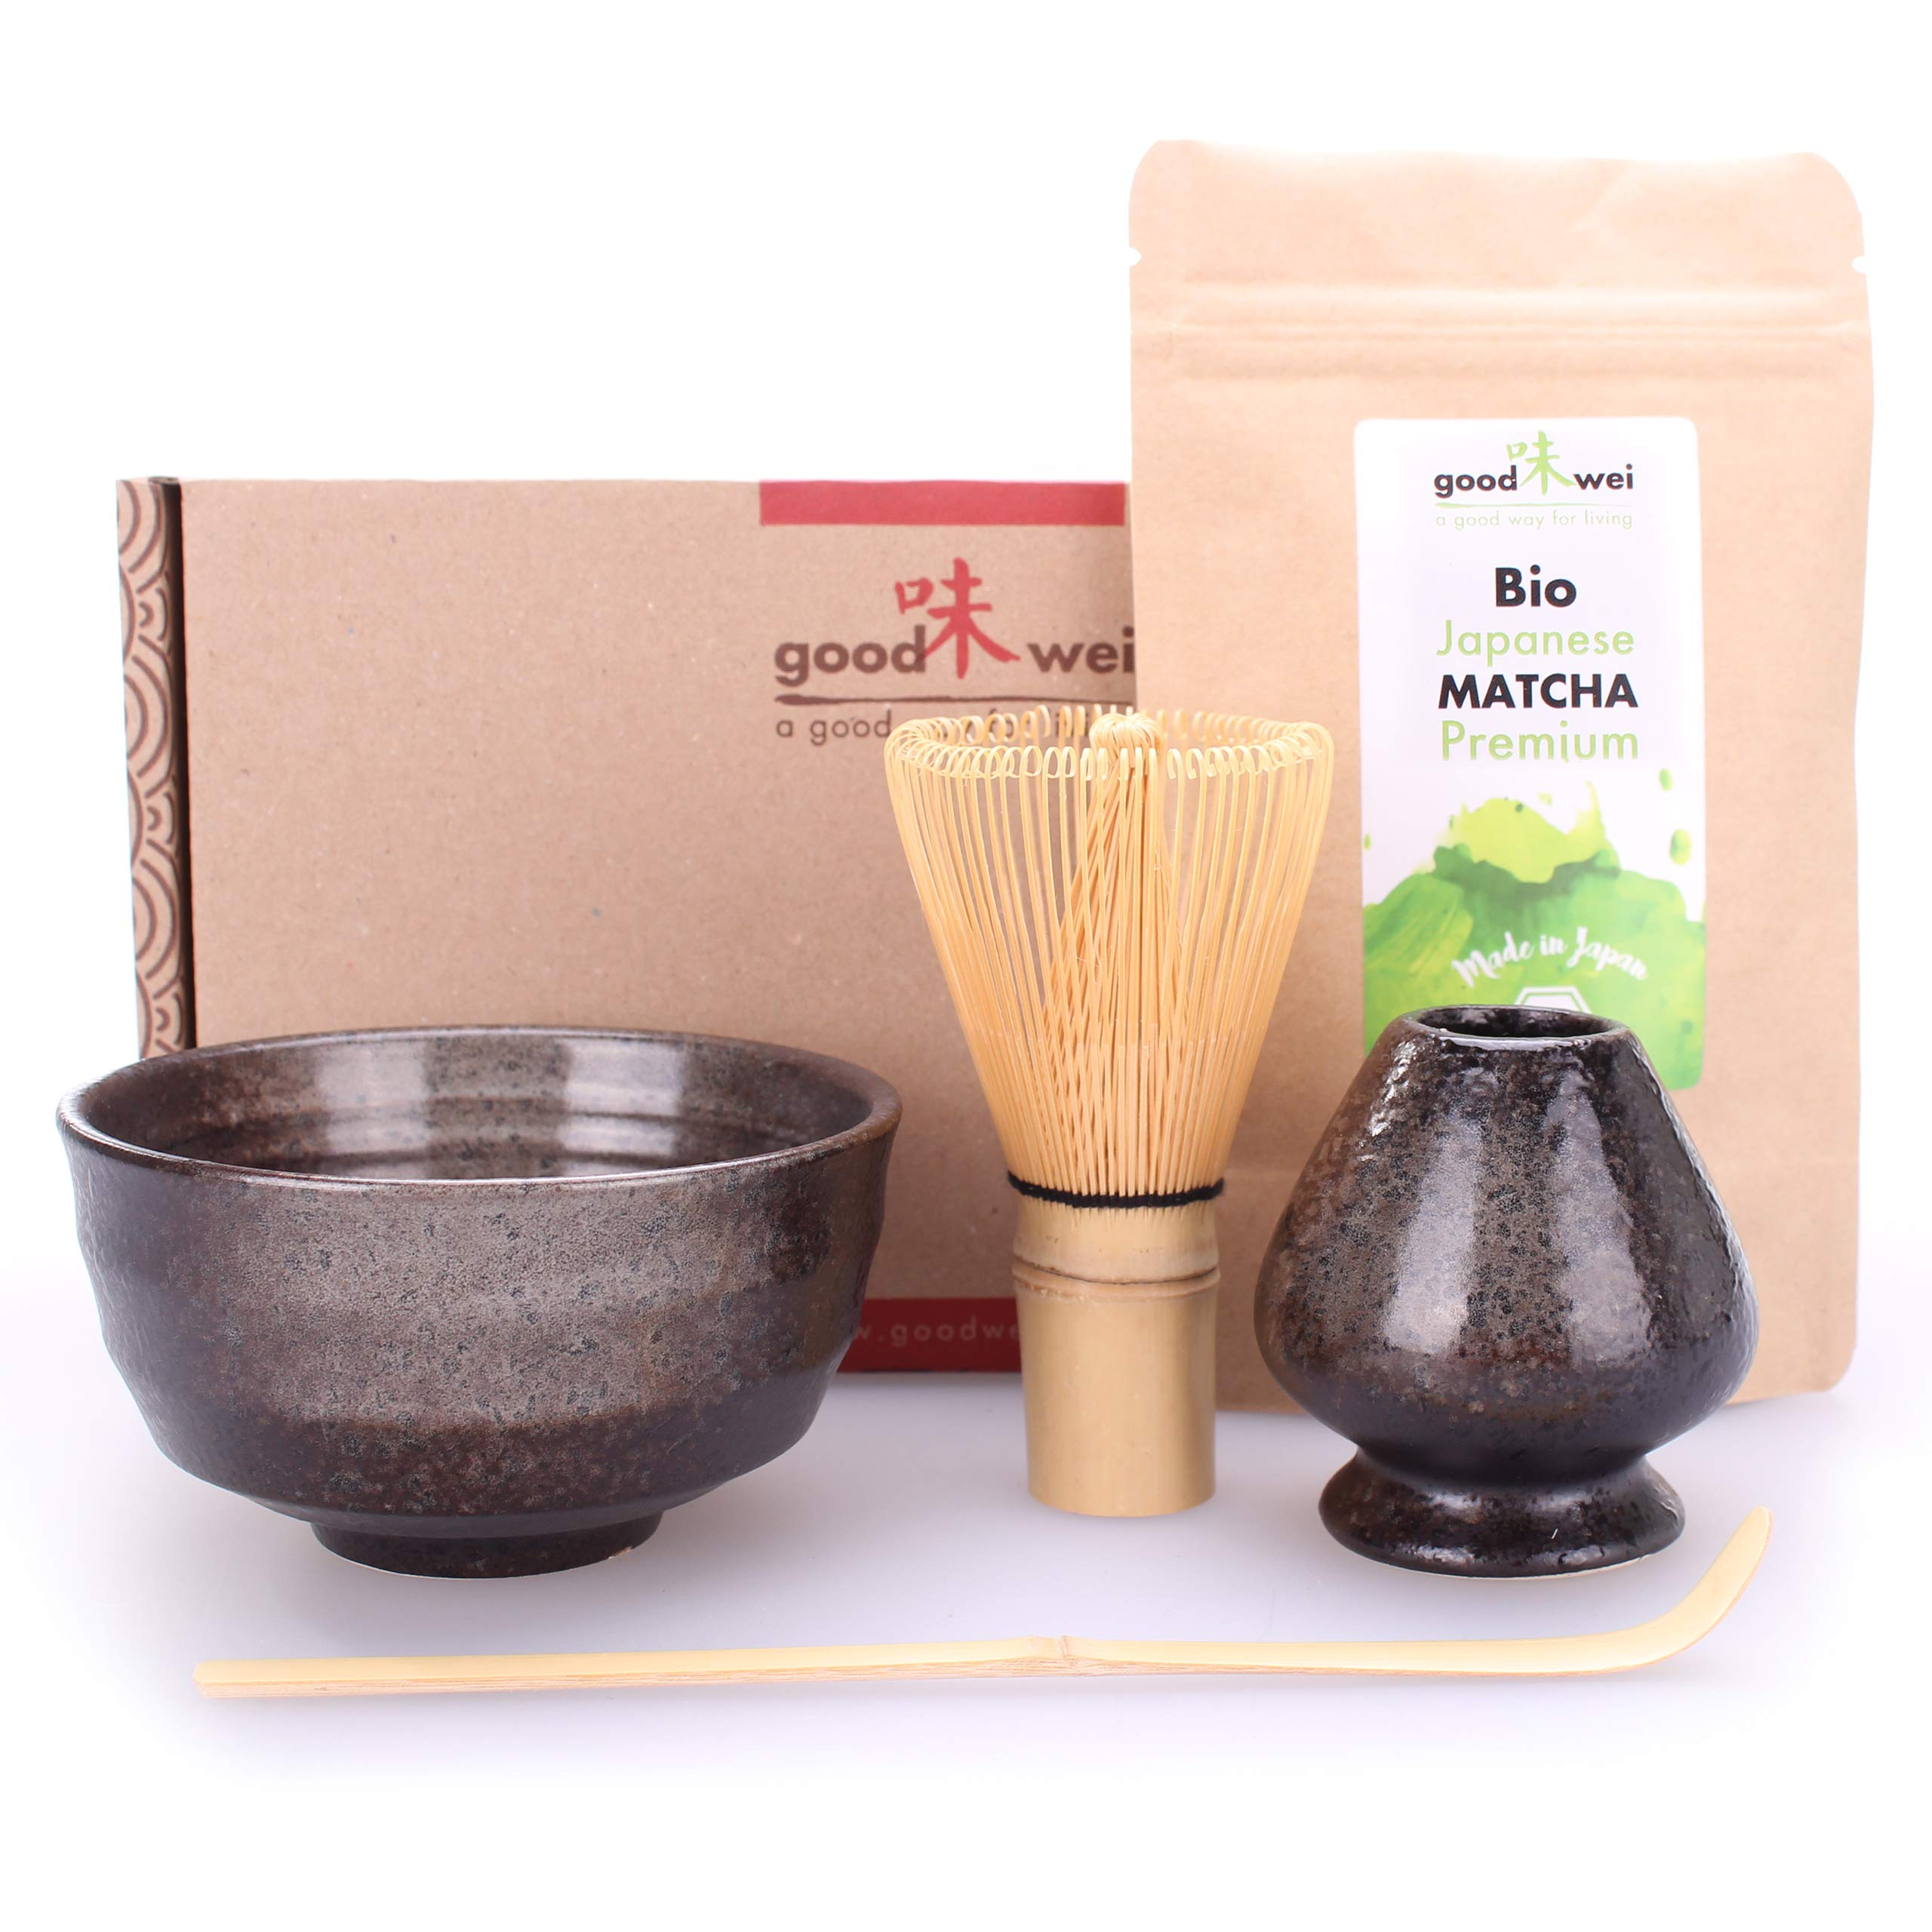 Matcha-Komplett-Set-inkl-Bio-Matcha-Tee